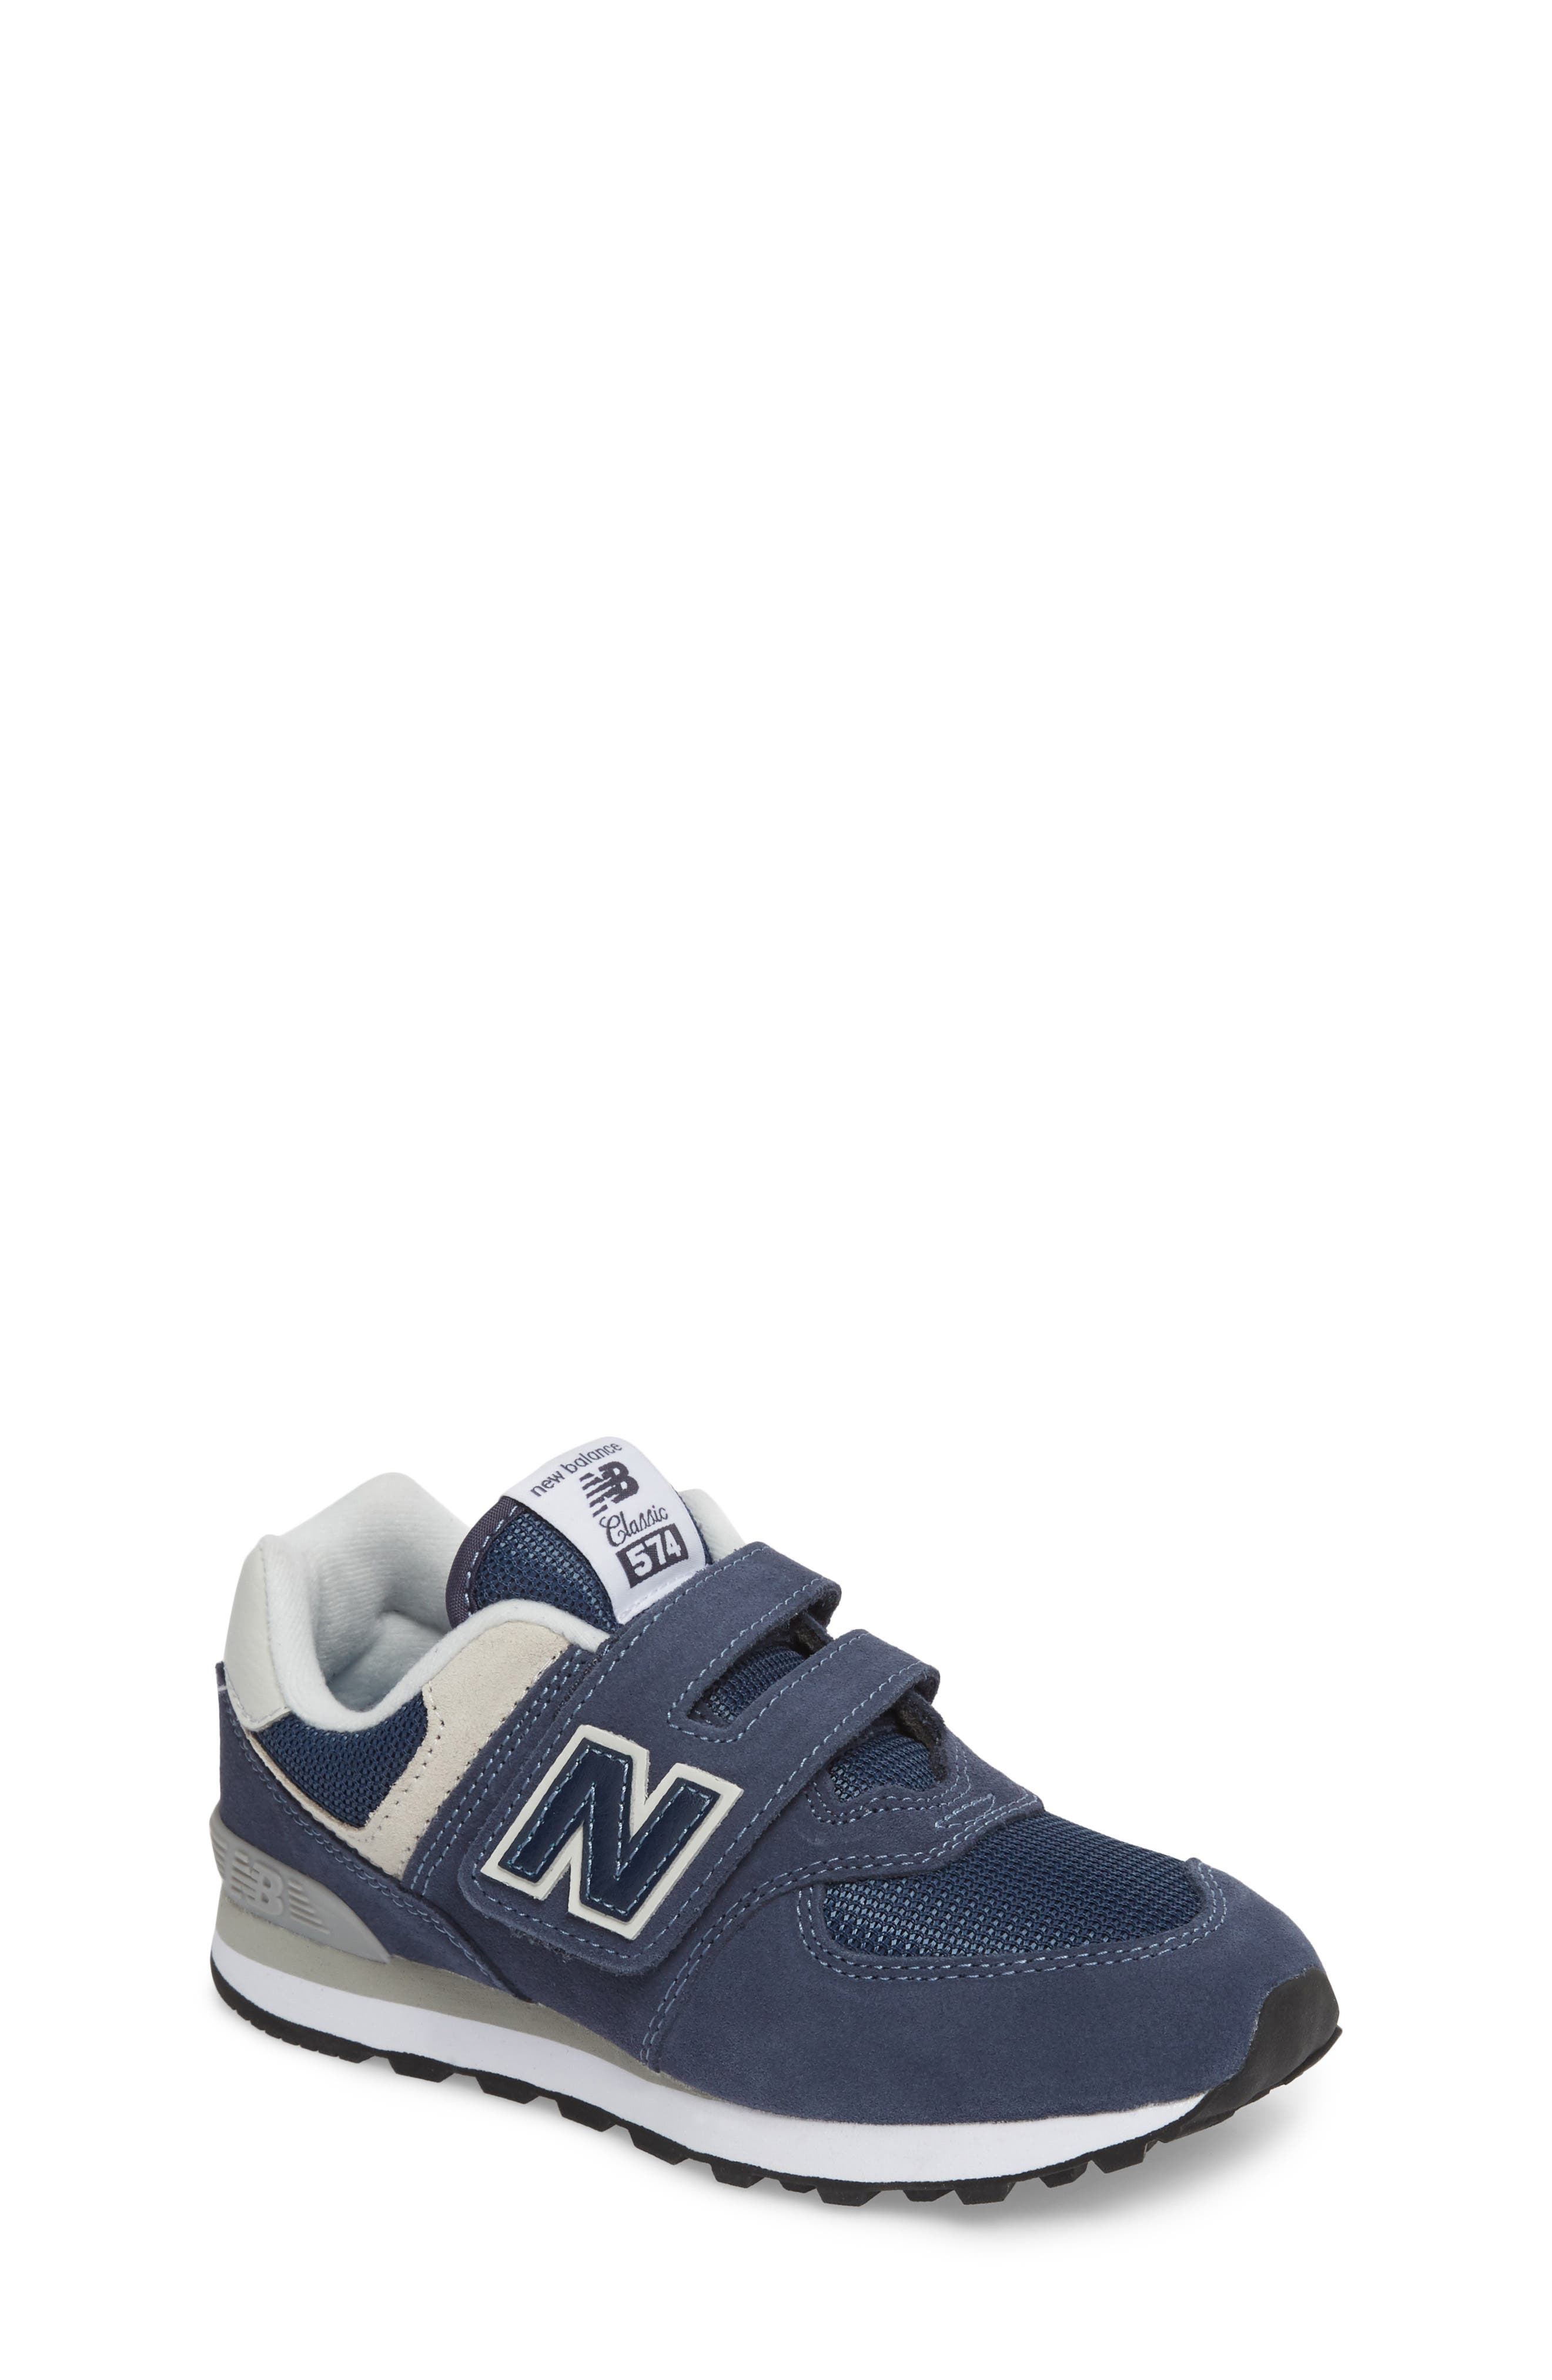 New Balance 574 Retro Surf Sneaker